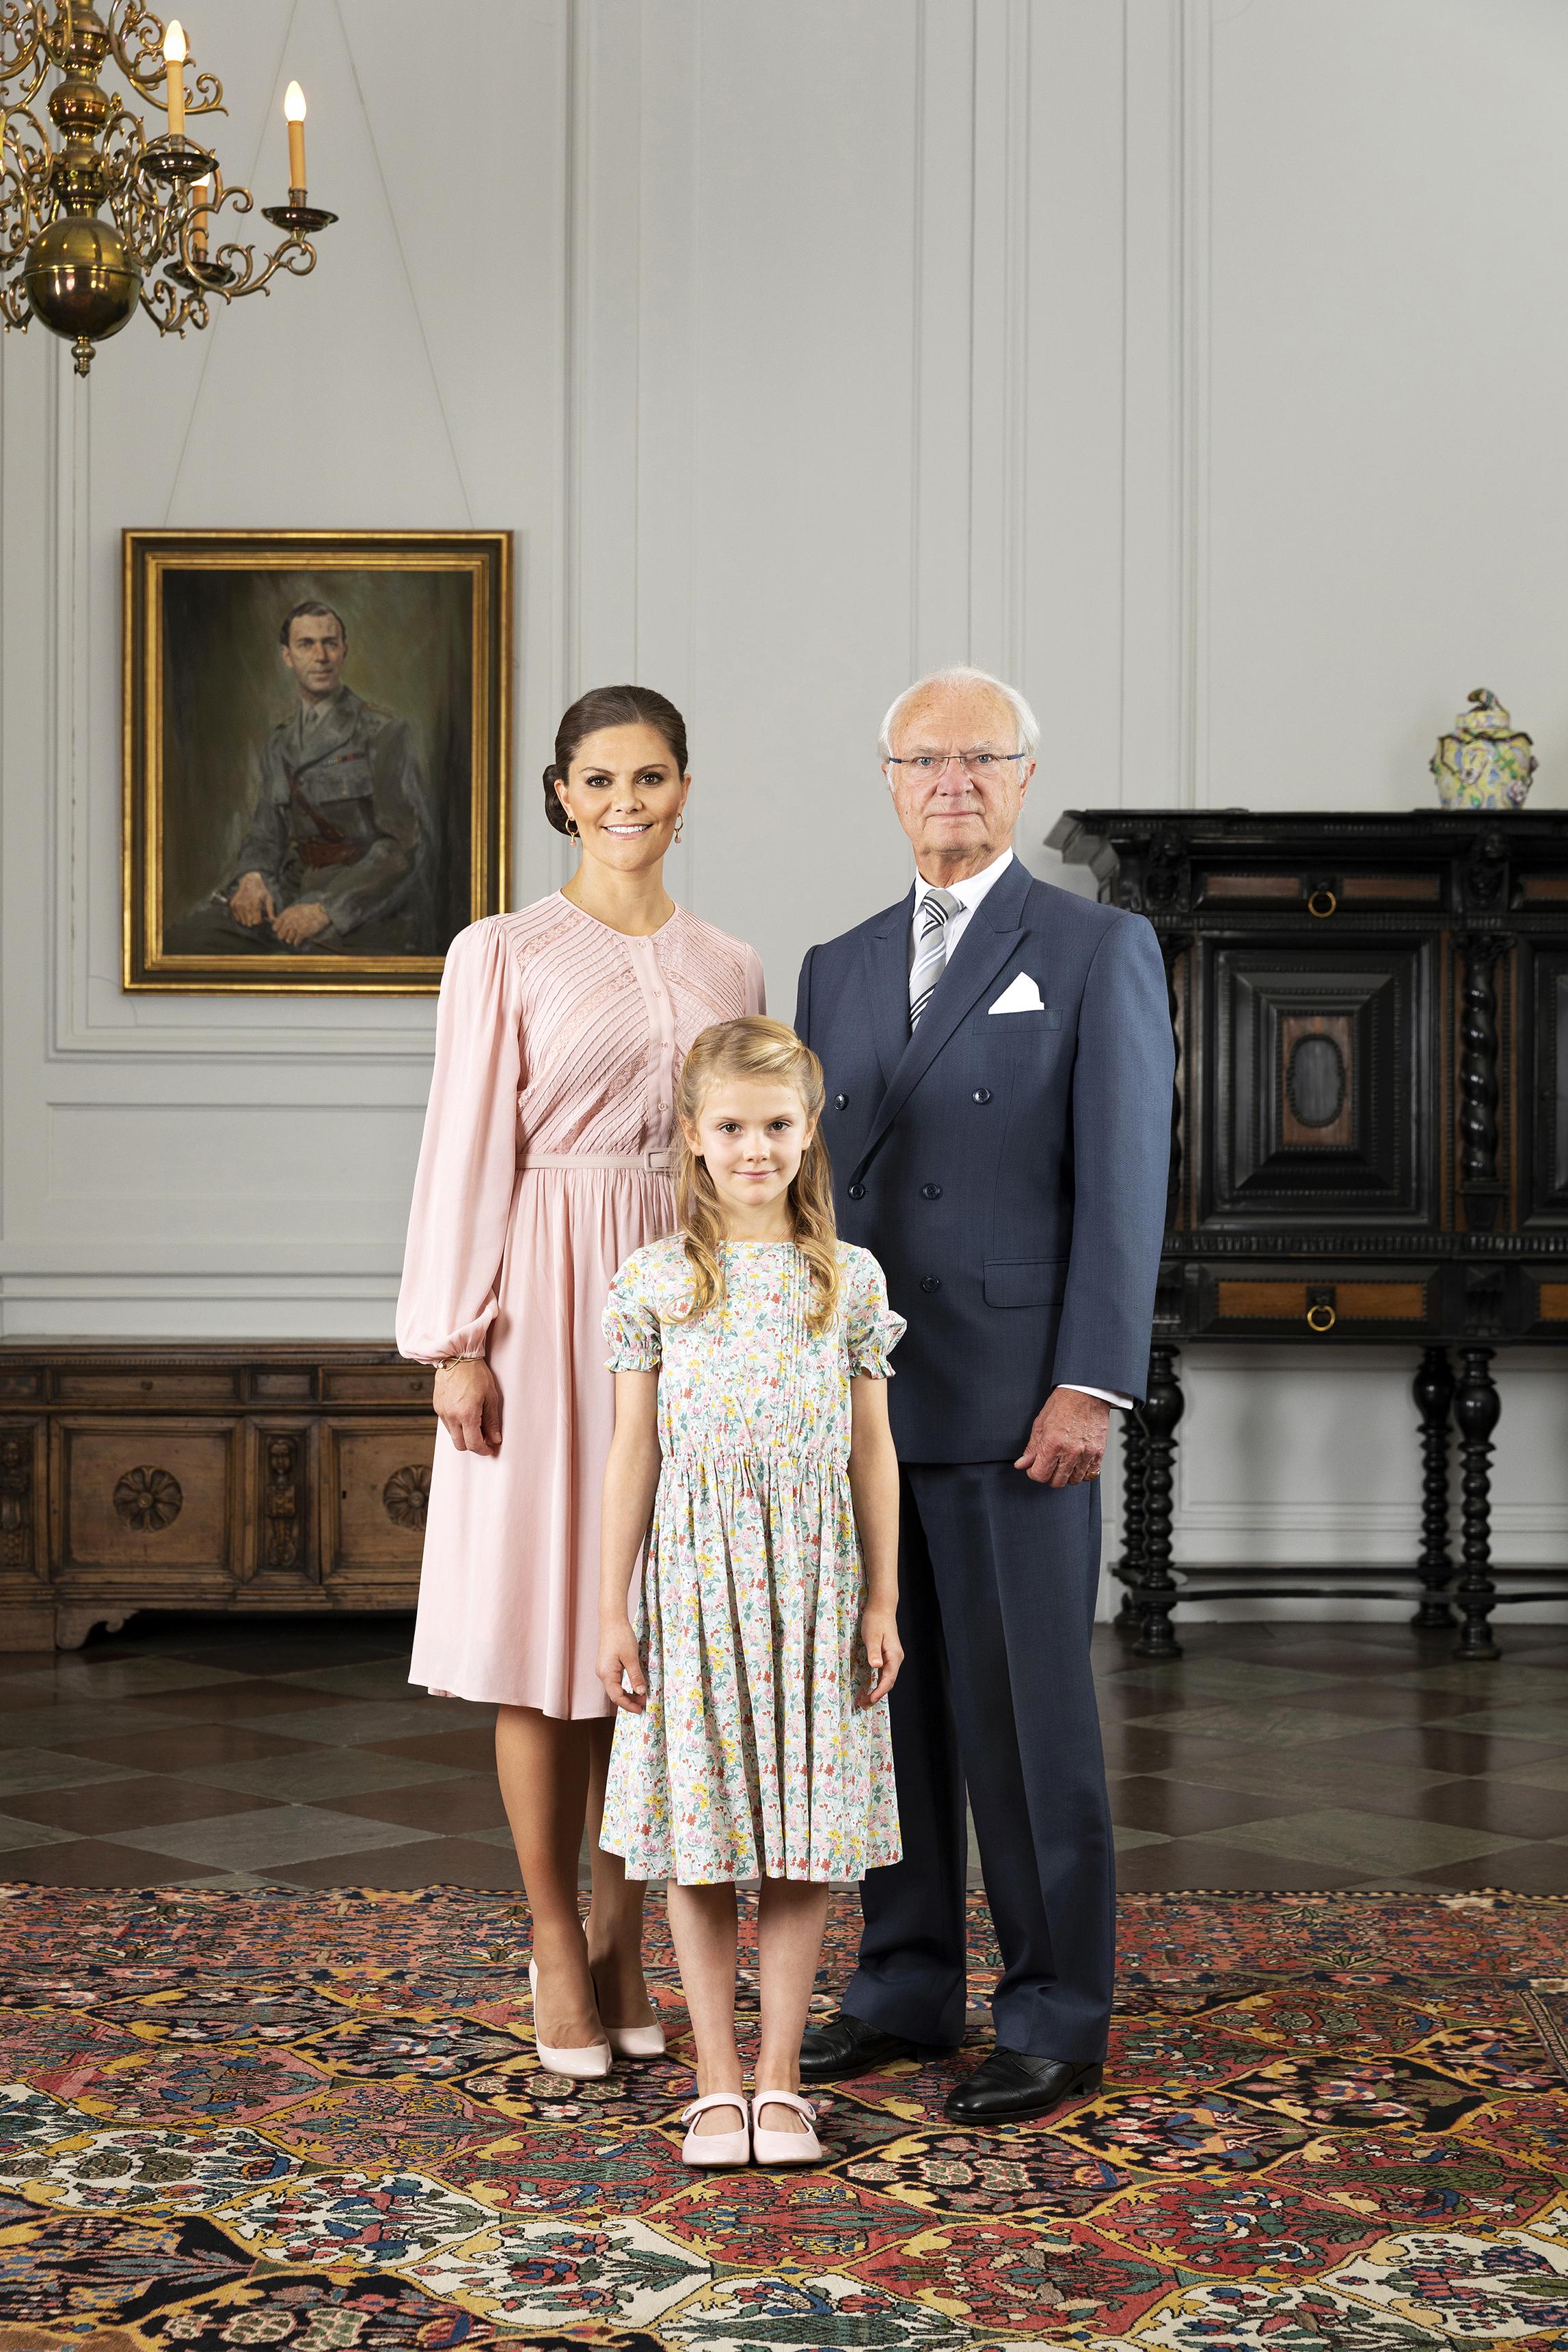 H.M. Konung Carl XVI Gustaf, H.K.H. Kronprinsessan Victoria, H.K